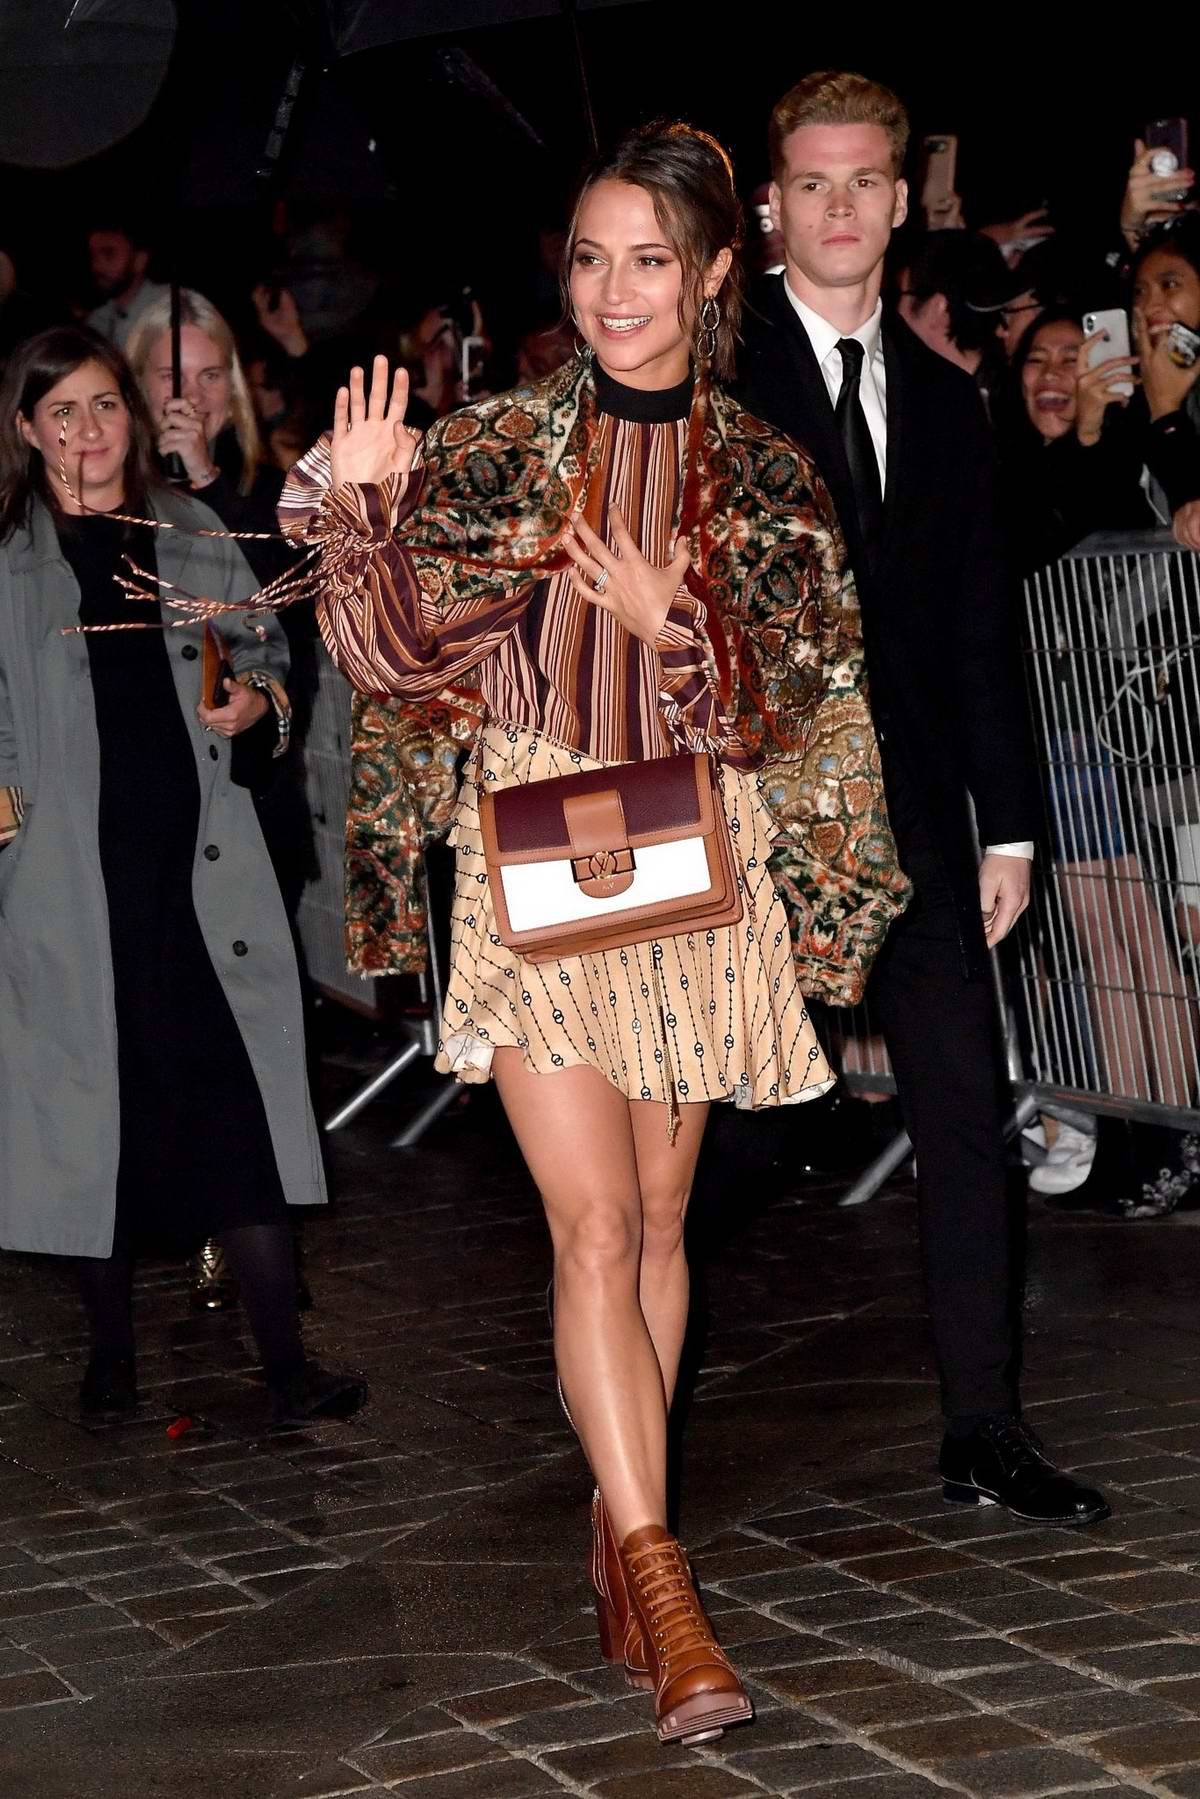 Alicia Vikander attending the Louis Vuitton show during Paris Fashion Week in Paris, France